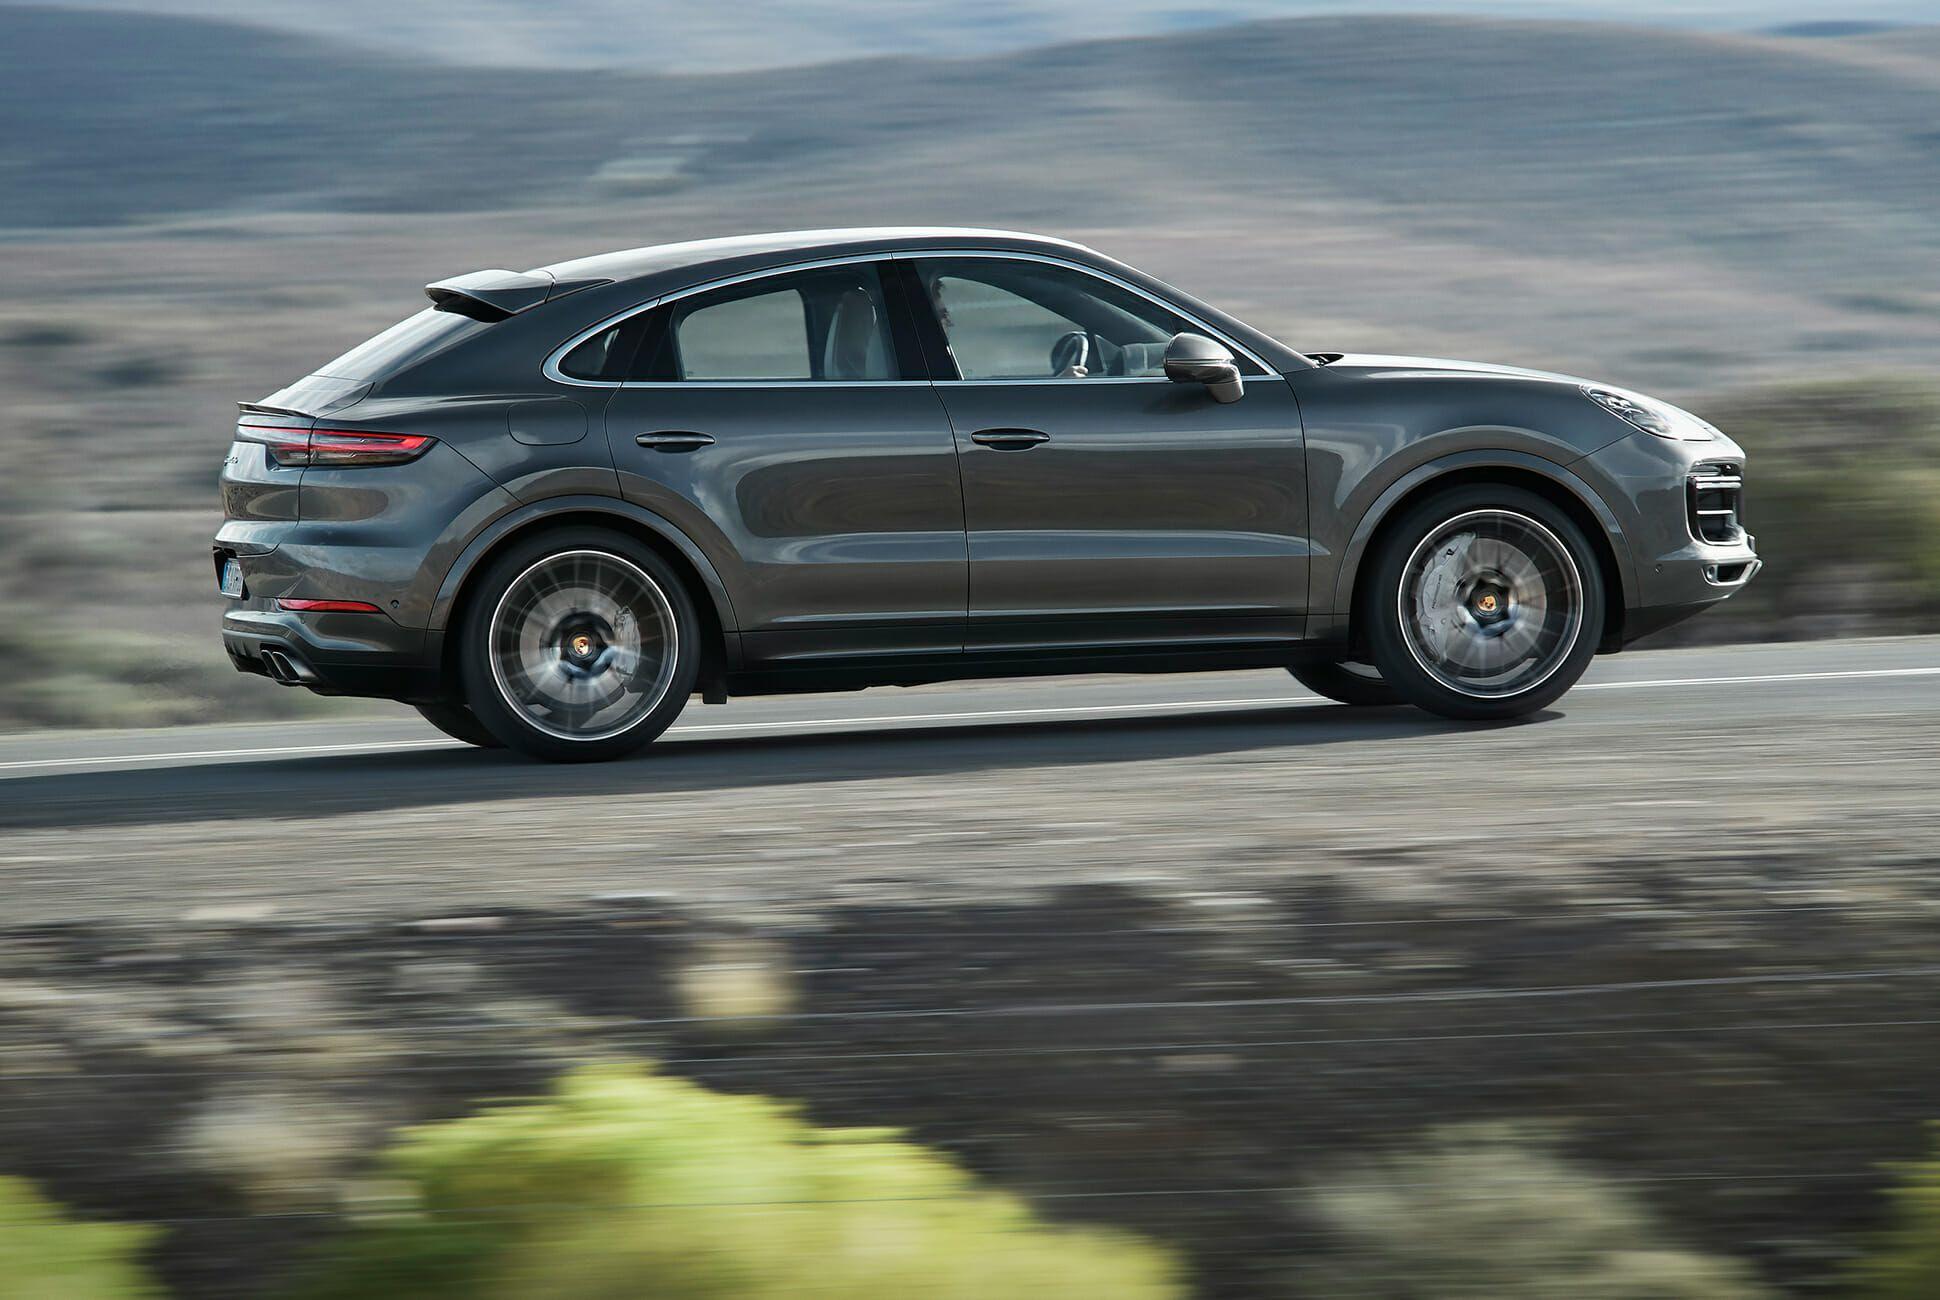 2020-Porsche-Cayenne-Coupe-gear-patrol-slide-2